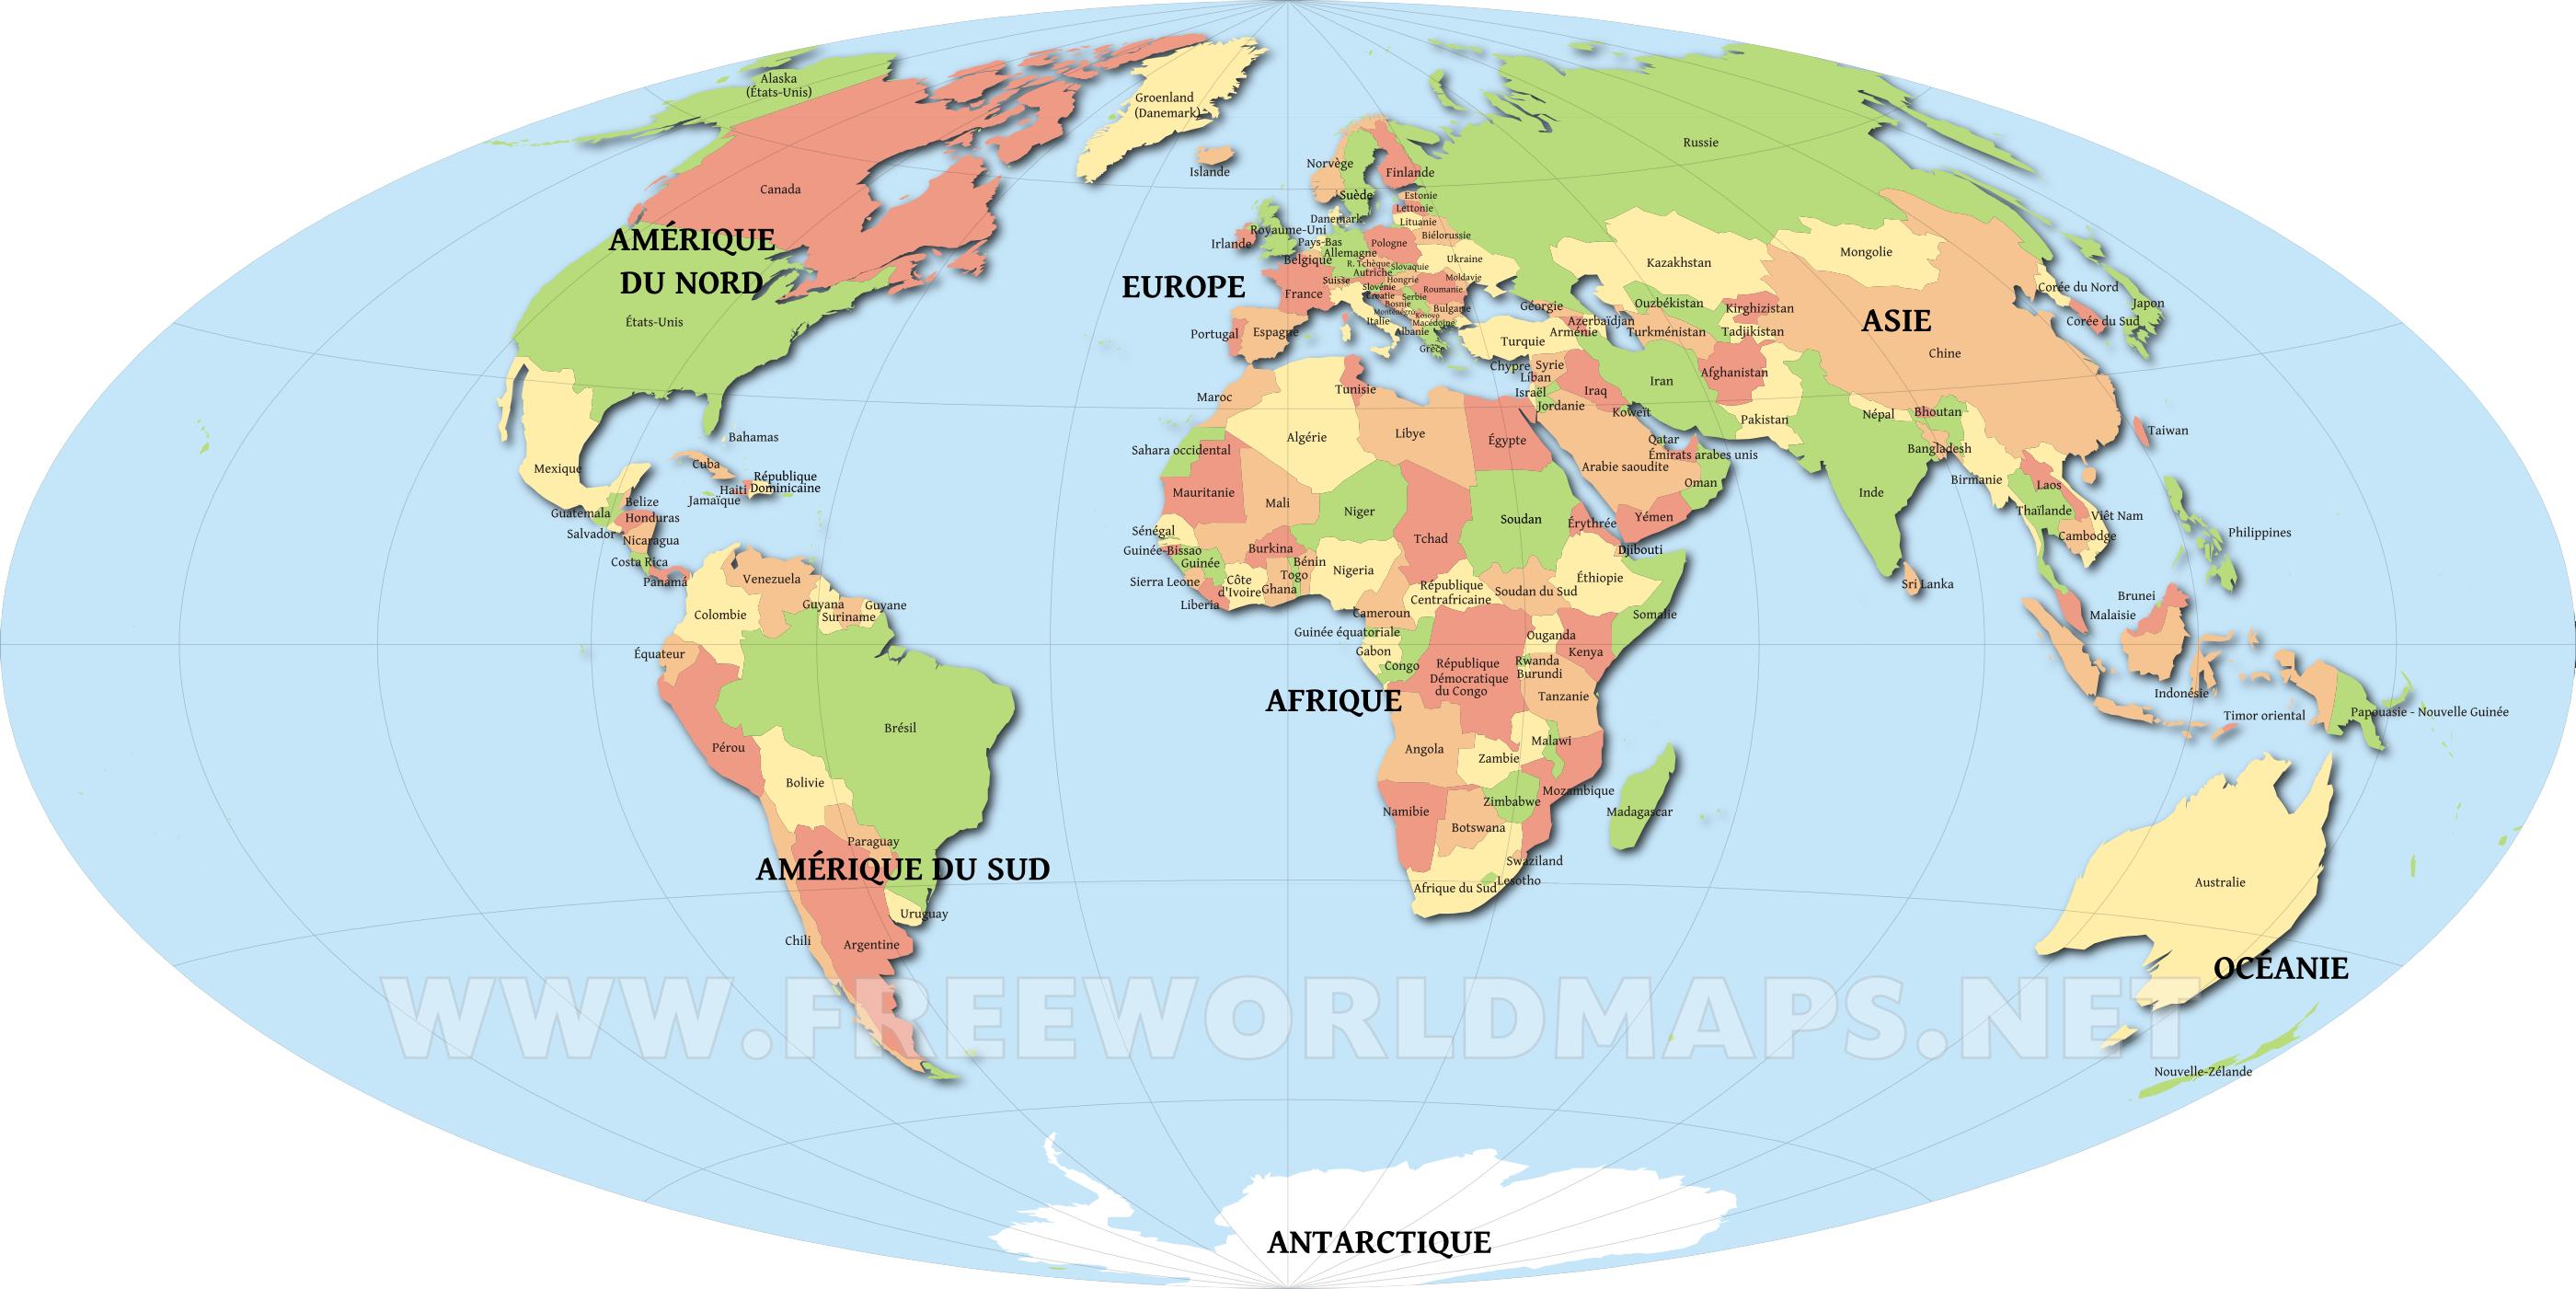 Grandecartedumondesimpleg 28001401 civisl pinterest printable world map countries of the world publicscrutiny Gallery